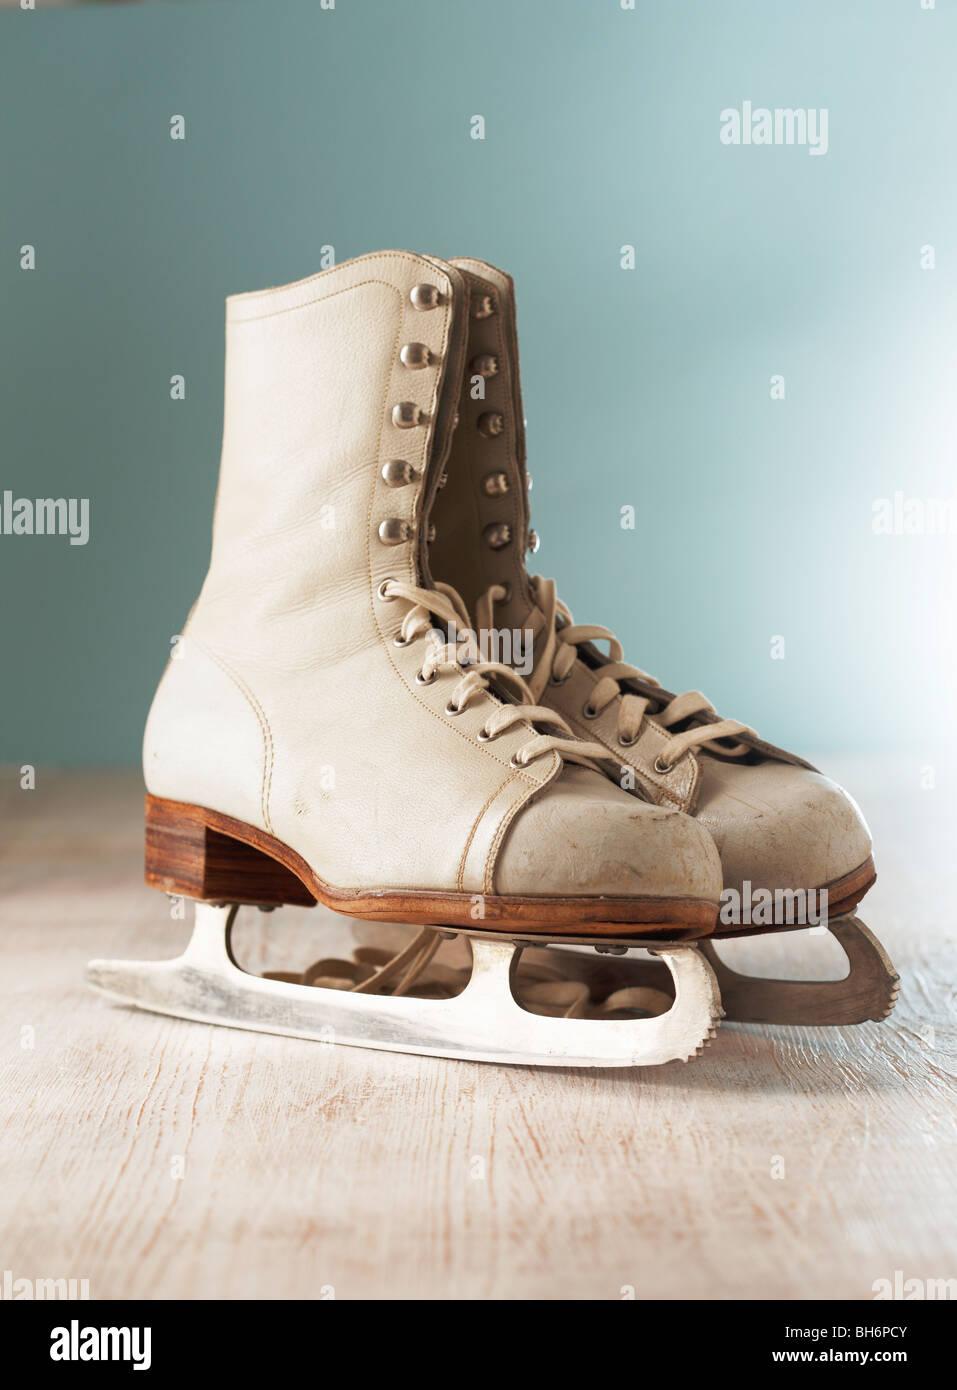 ice skates photos ice skates images alamy. Black Bedroom Furniture Sets. Home Design Ideas